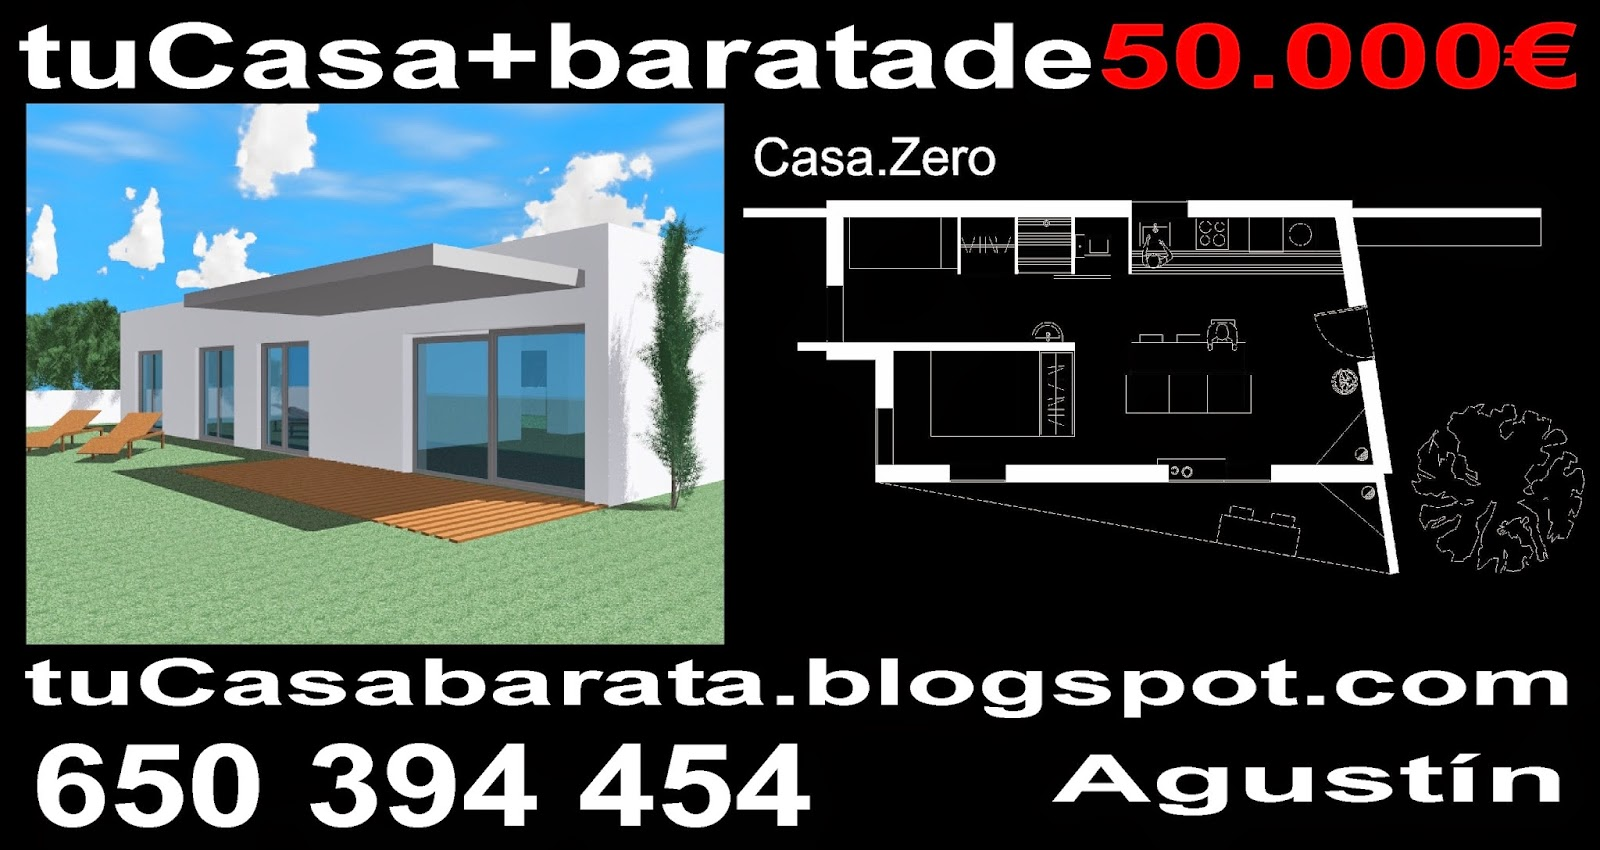 tuCasabarata.blogspot.com Agustu00edn 650394454: octubre 2014